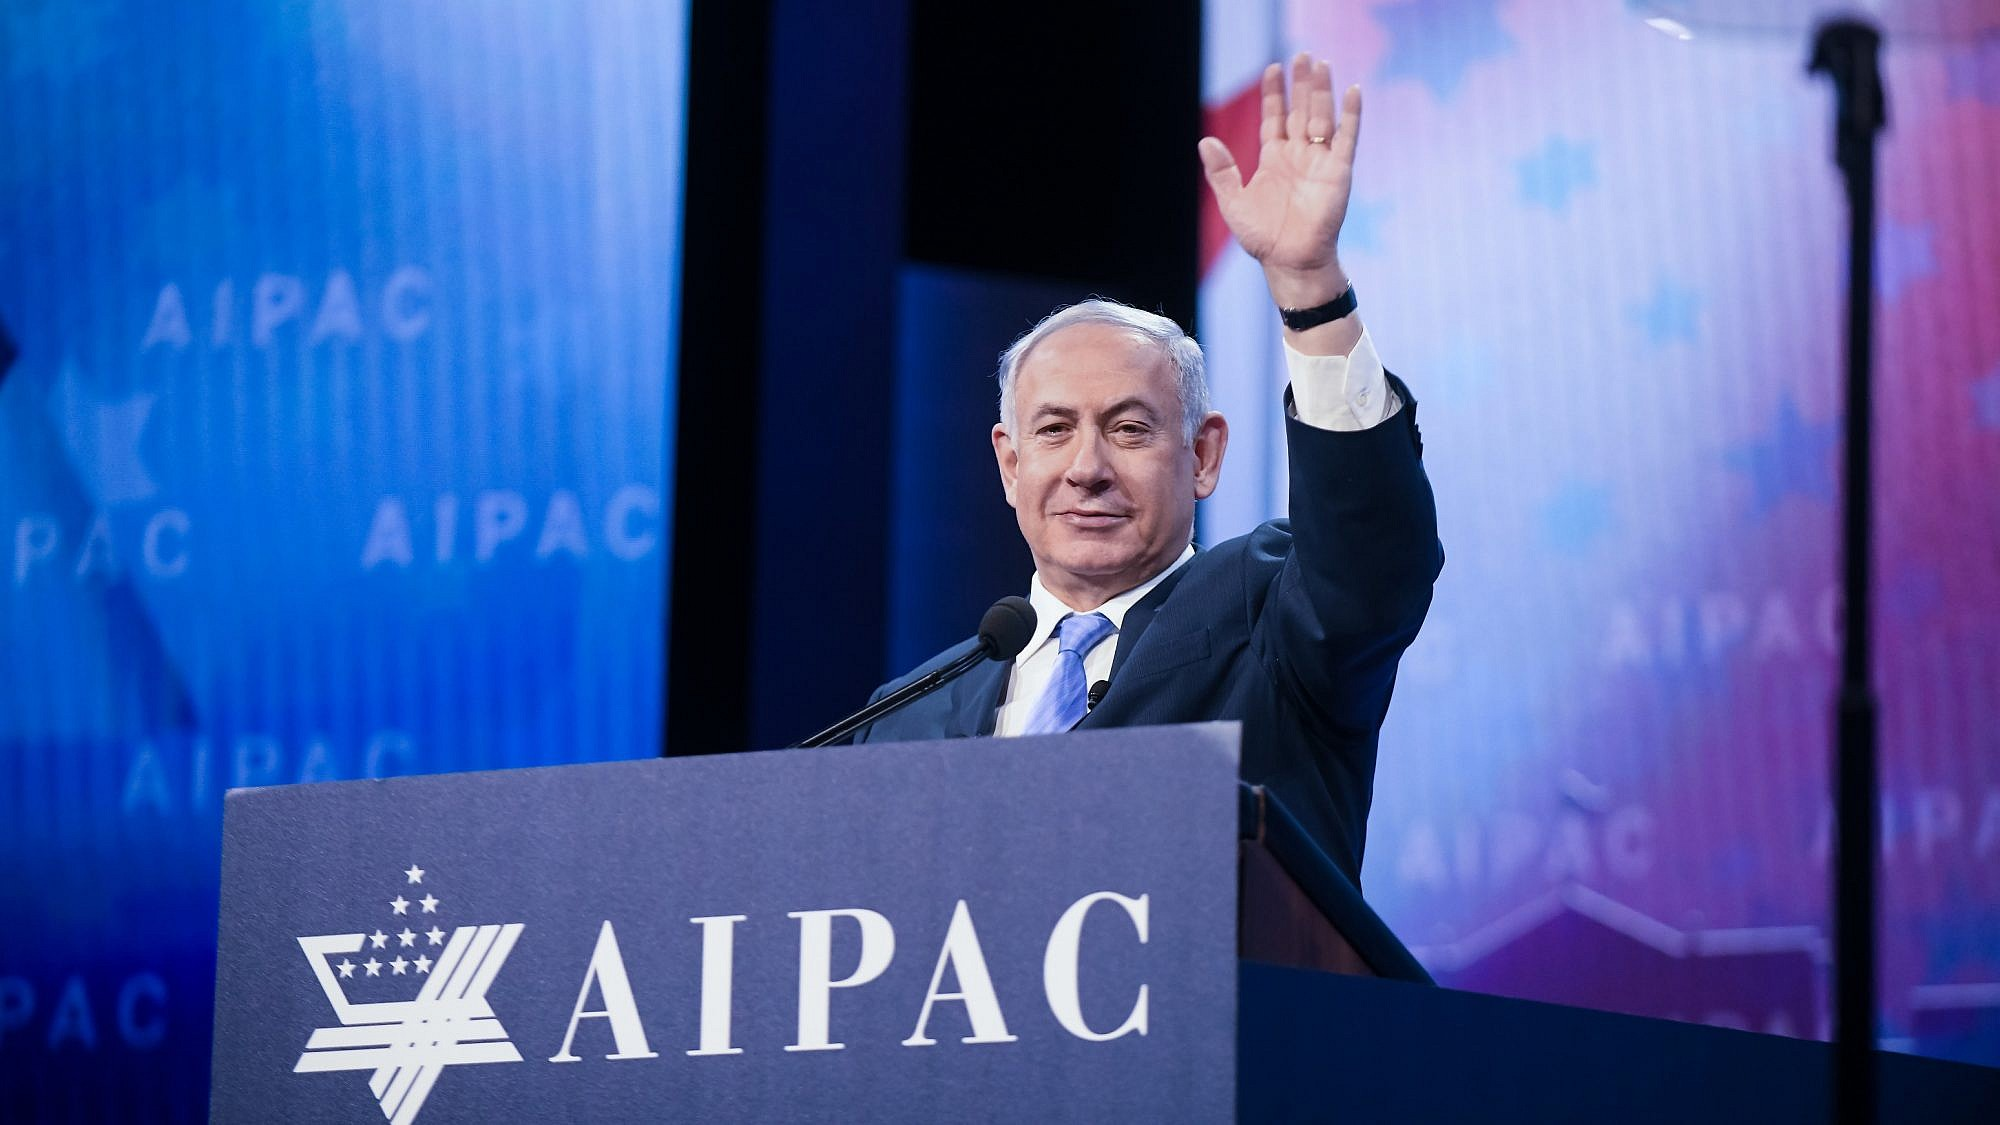 Israeli Prime Minister Benjamin Netanyahu at the 2018 AIPAC policy conference. Credit: AIPAC.